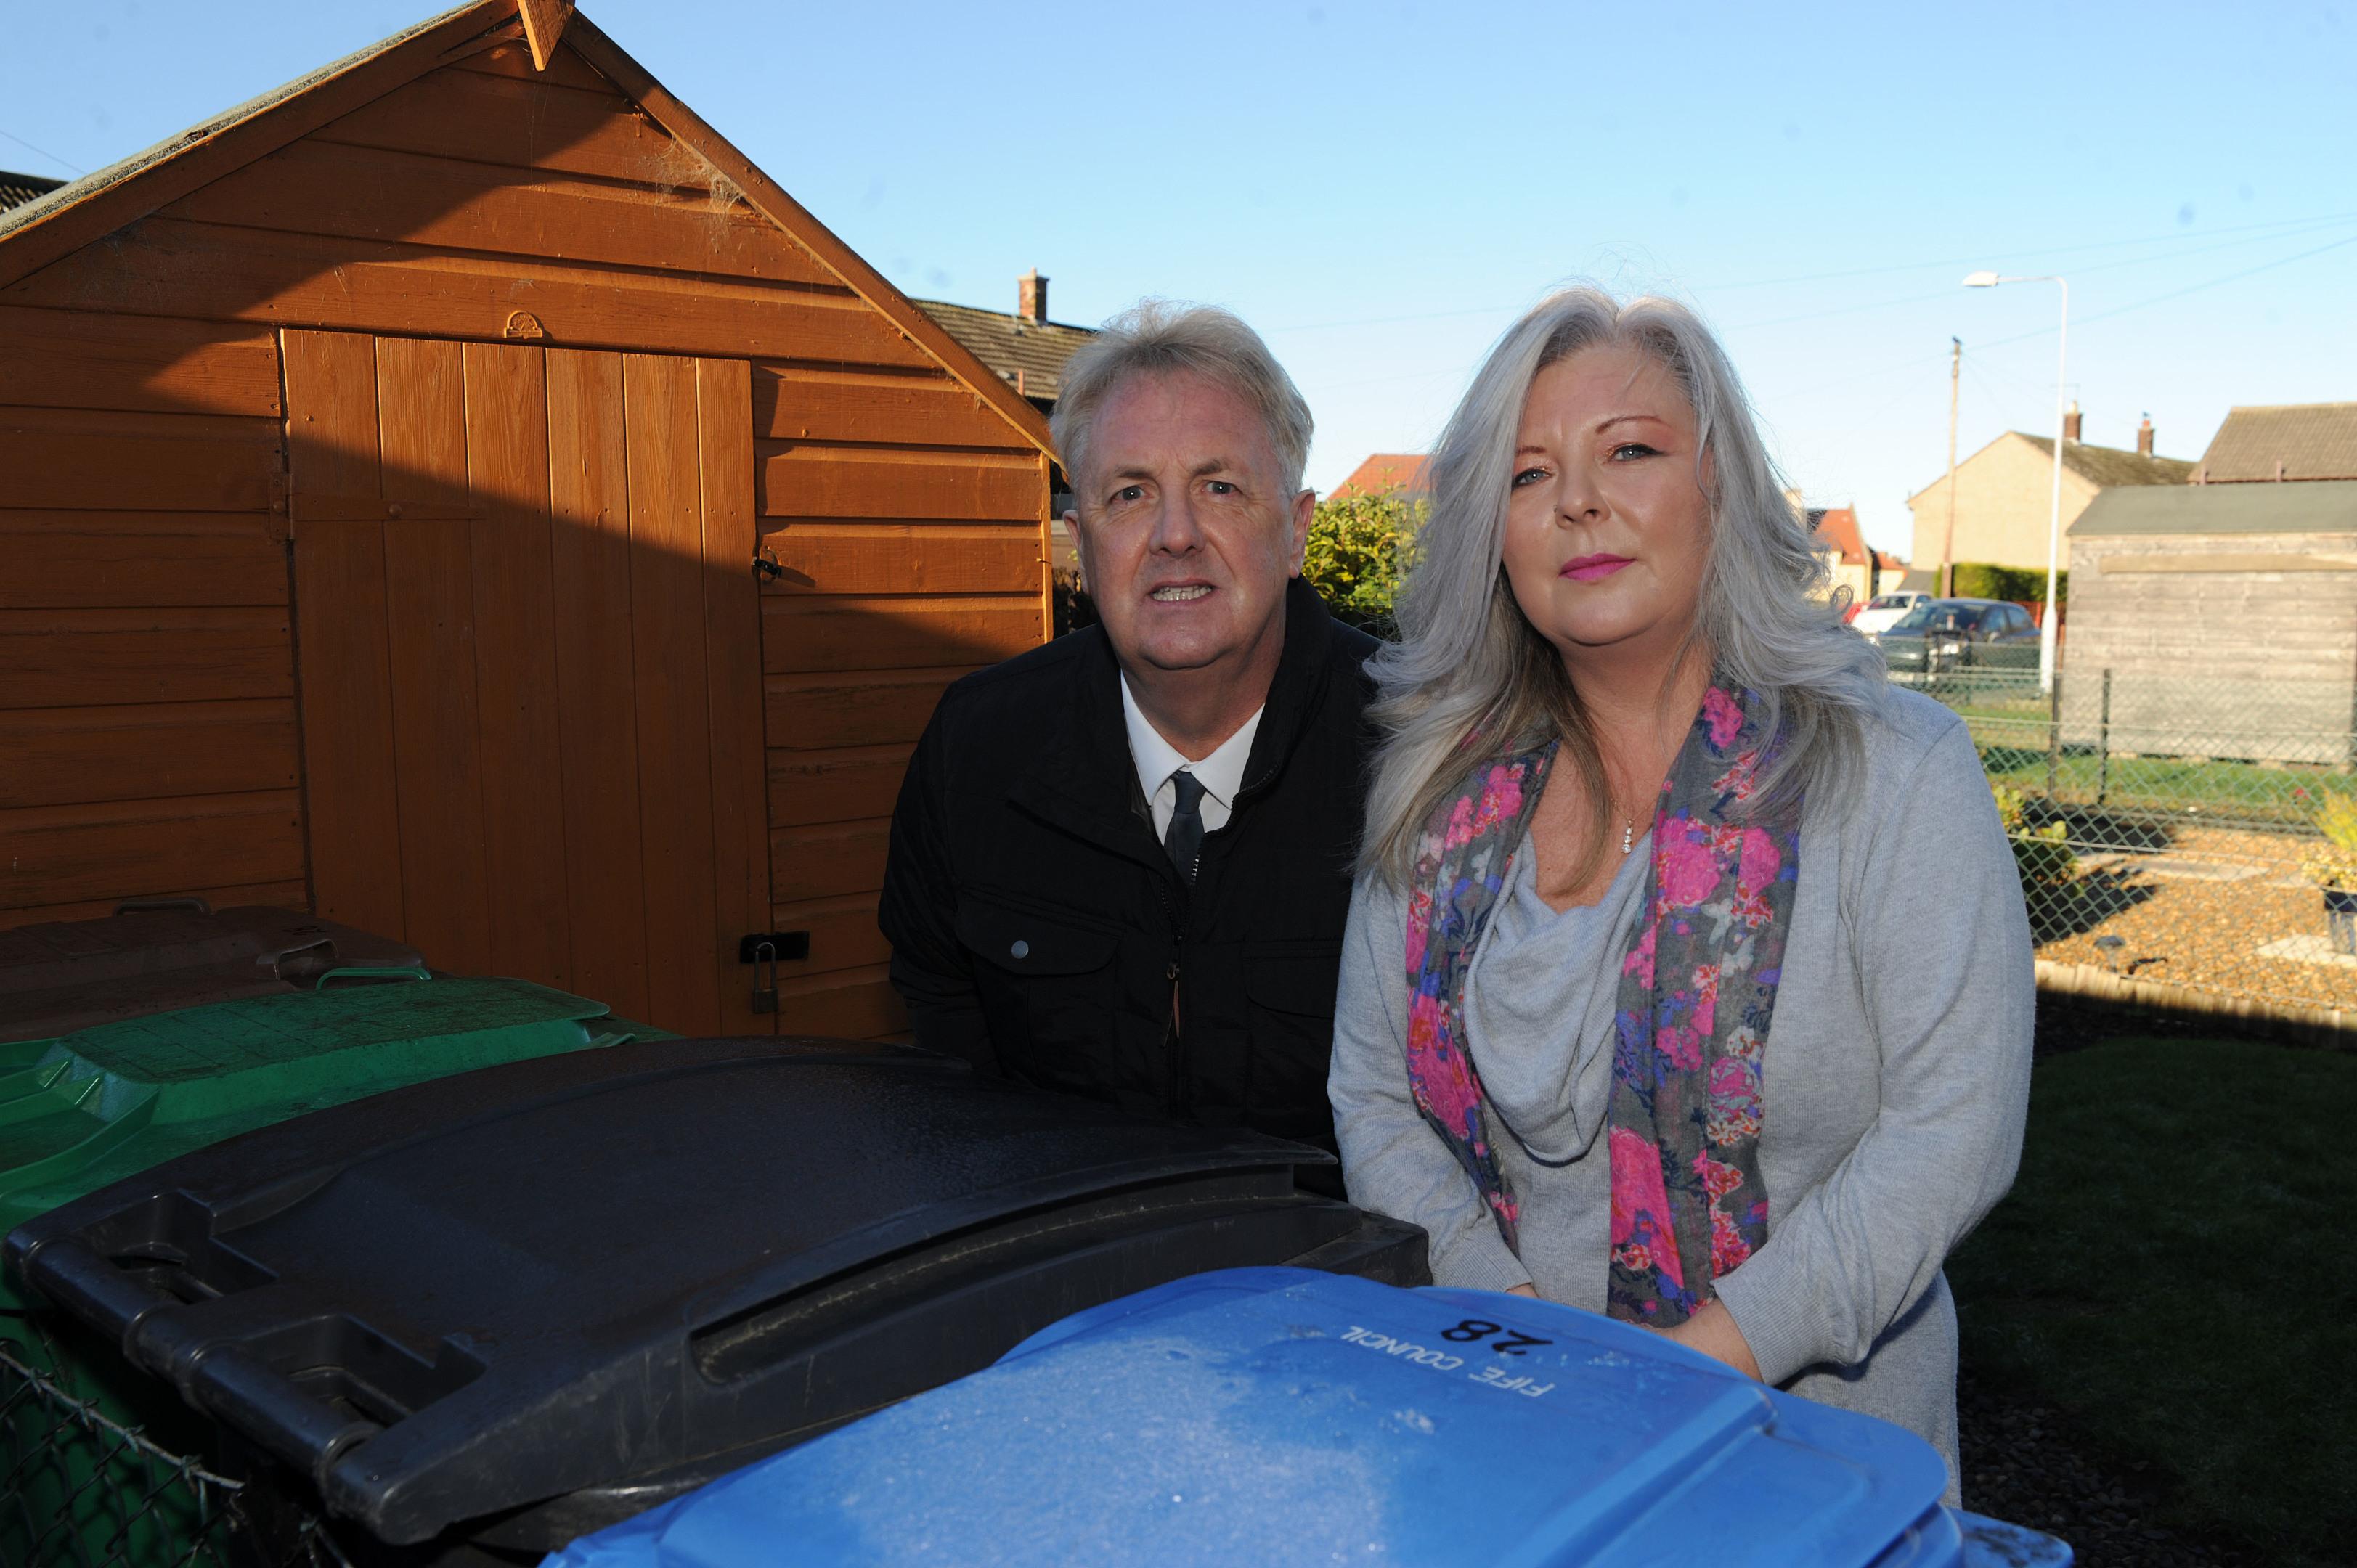 Tracey Richardson and Councillor John O'Brien want rid of the rats.